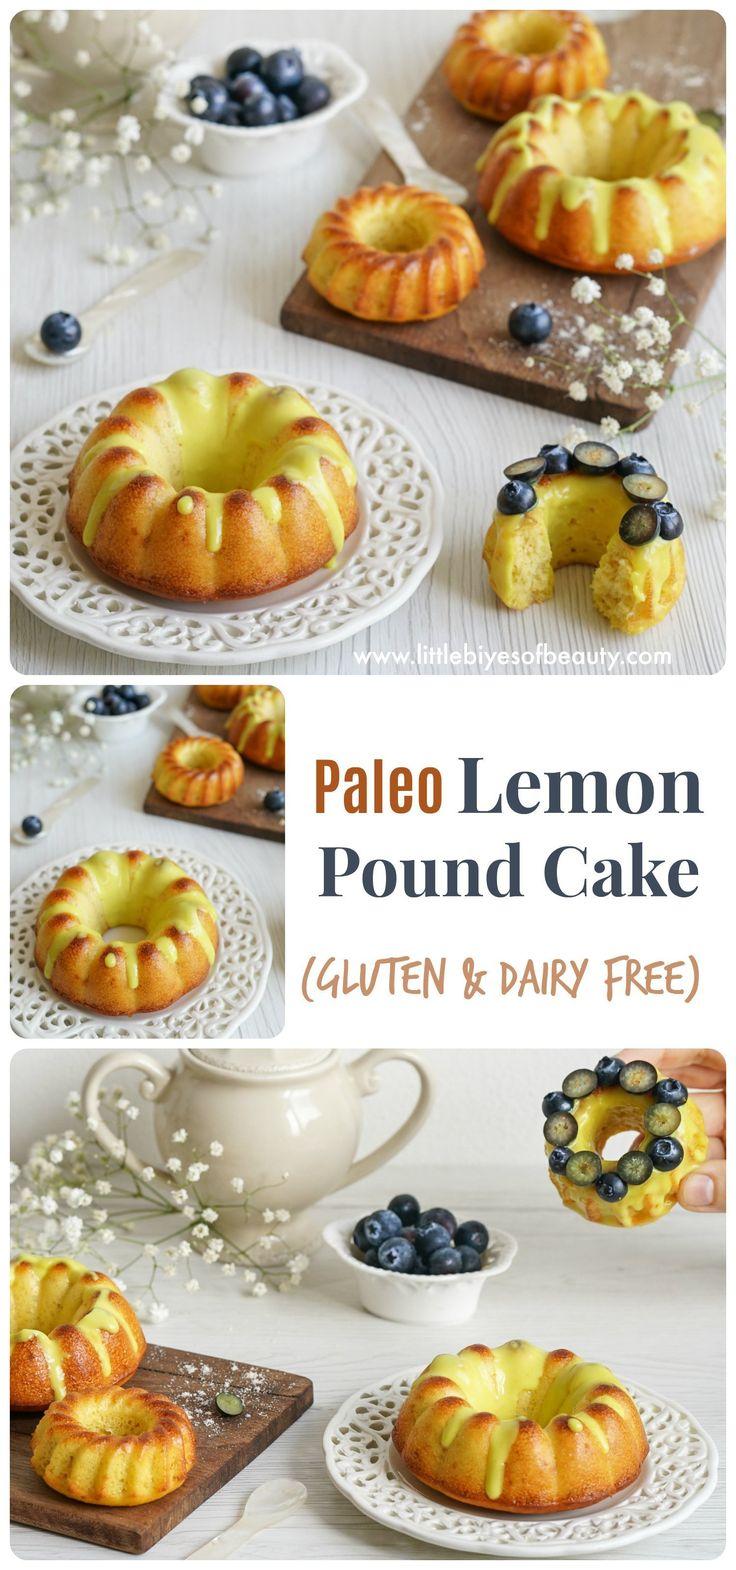 Paleo Lemon Pound Cake (Dairy & Gluten Free